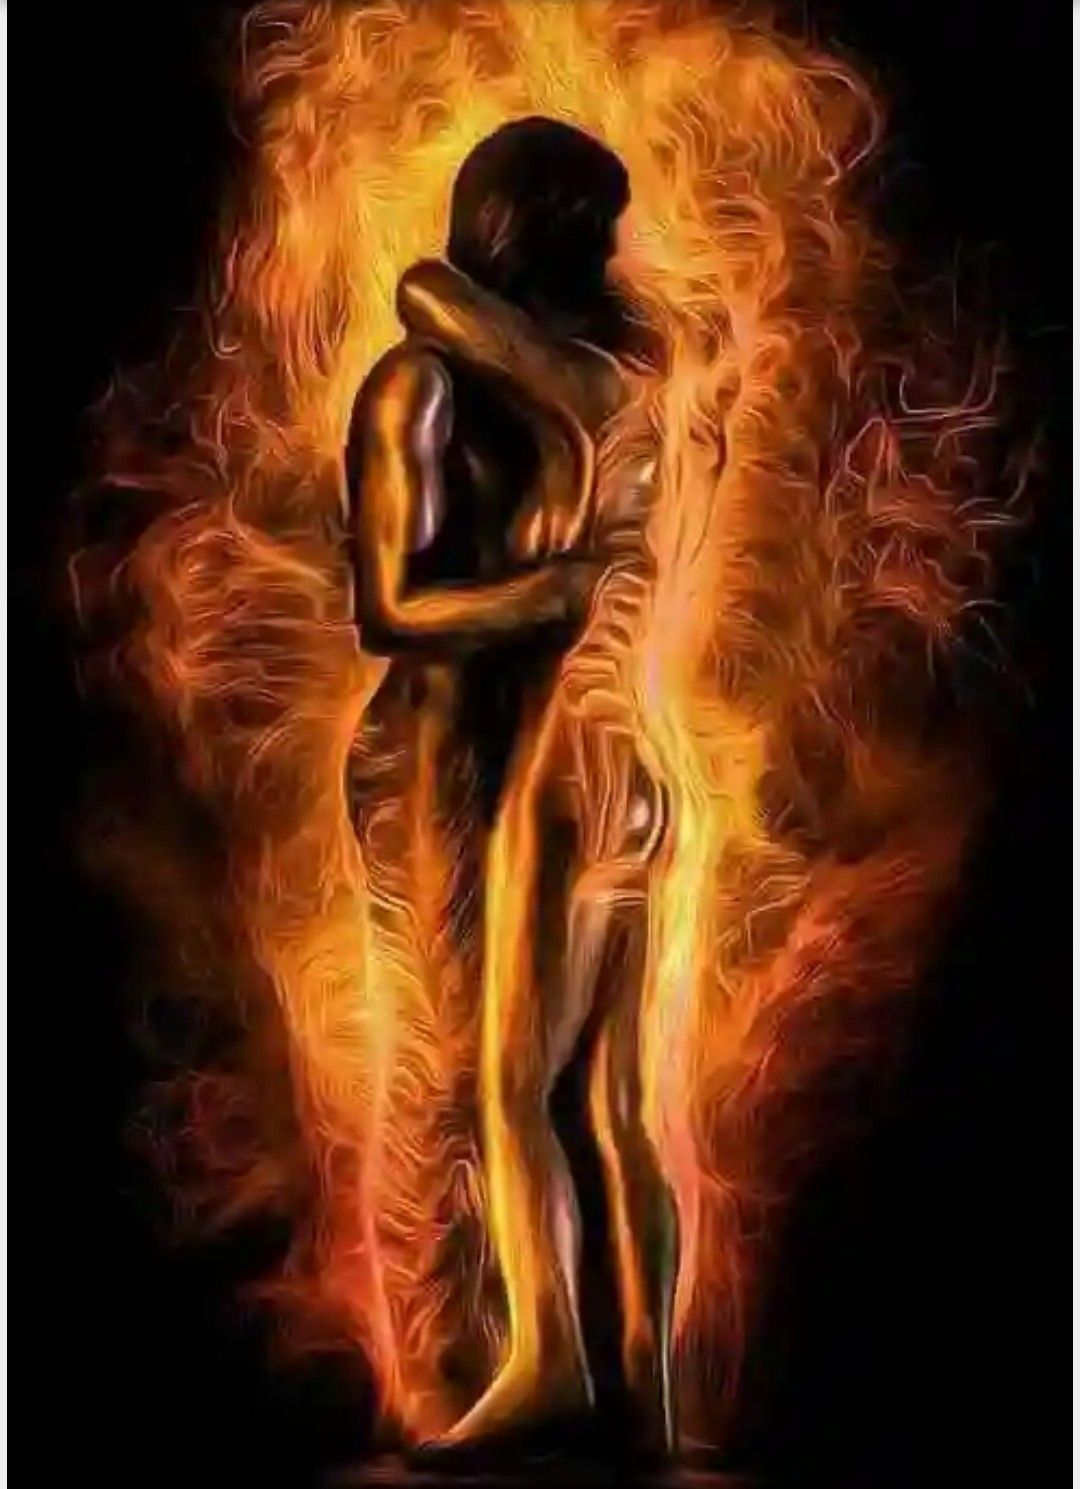 поцелуй в огне картинка армении